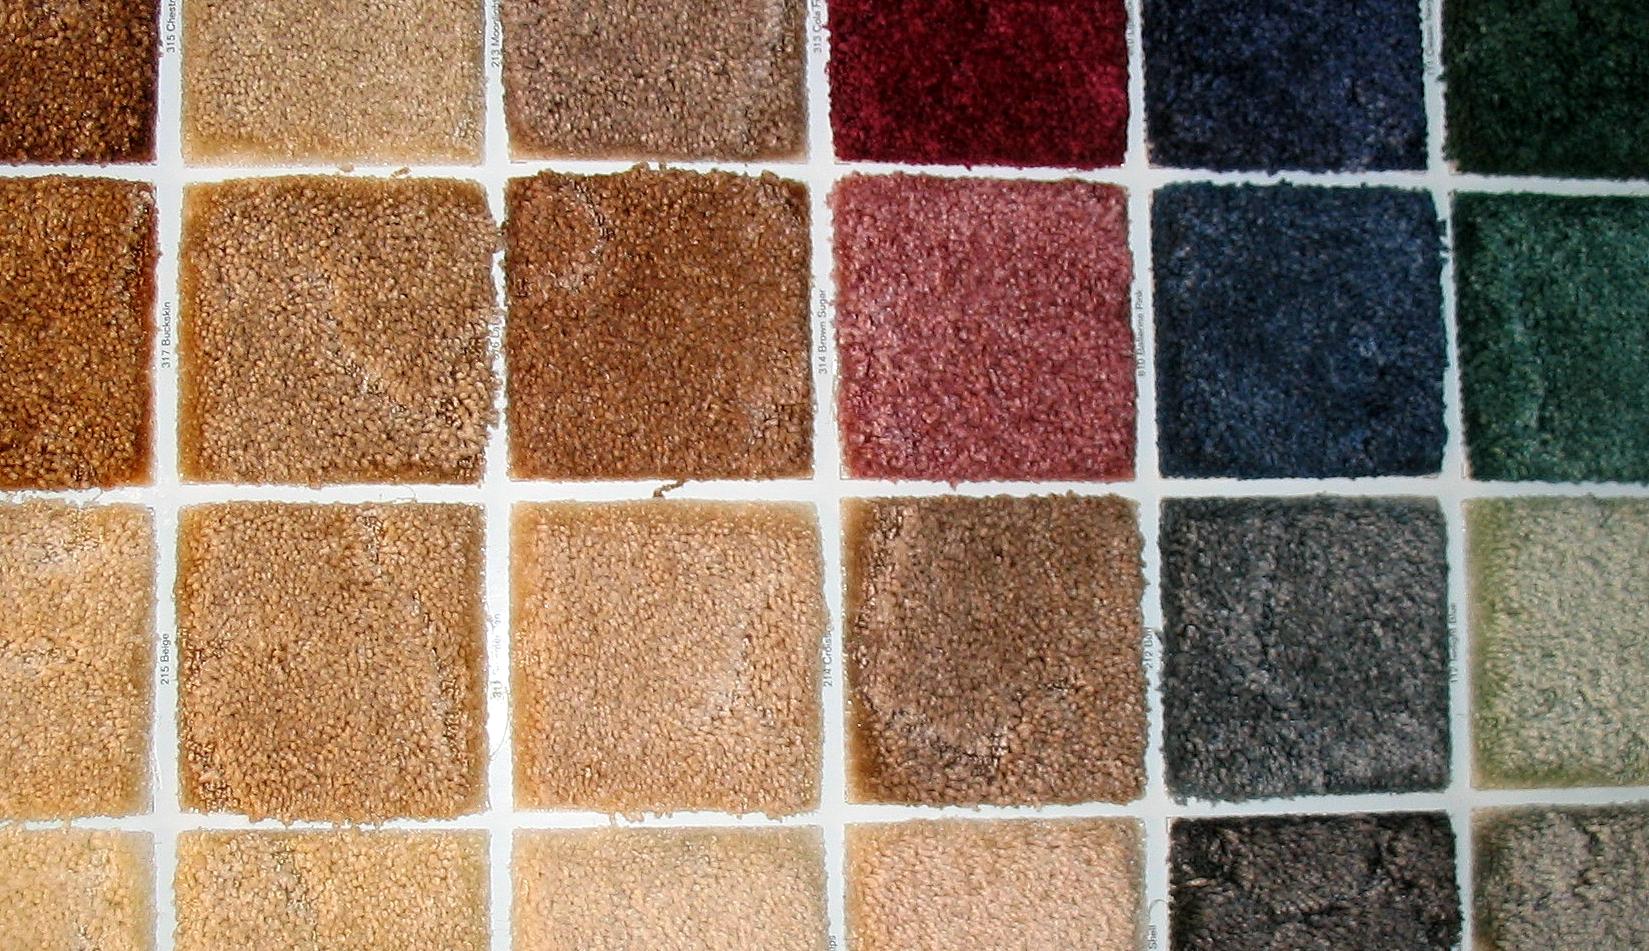 FileSwatches Of Carpet 1jpg Wikimedia Commons